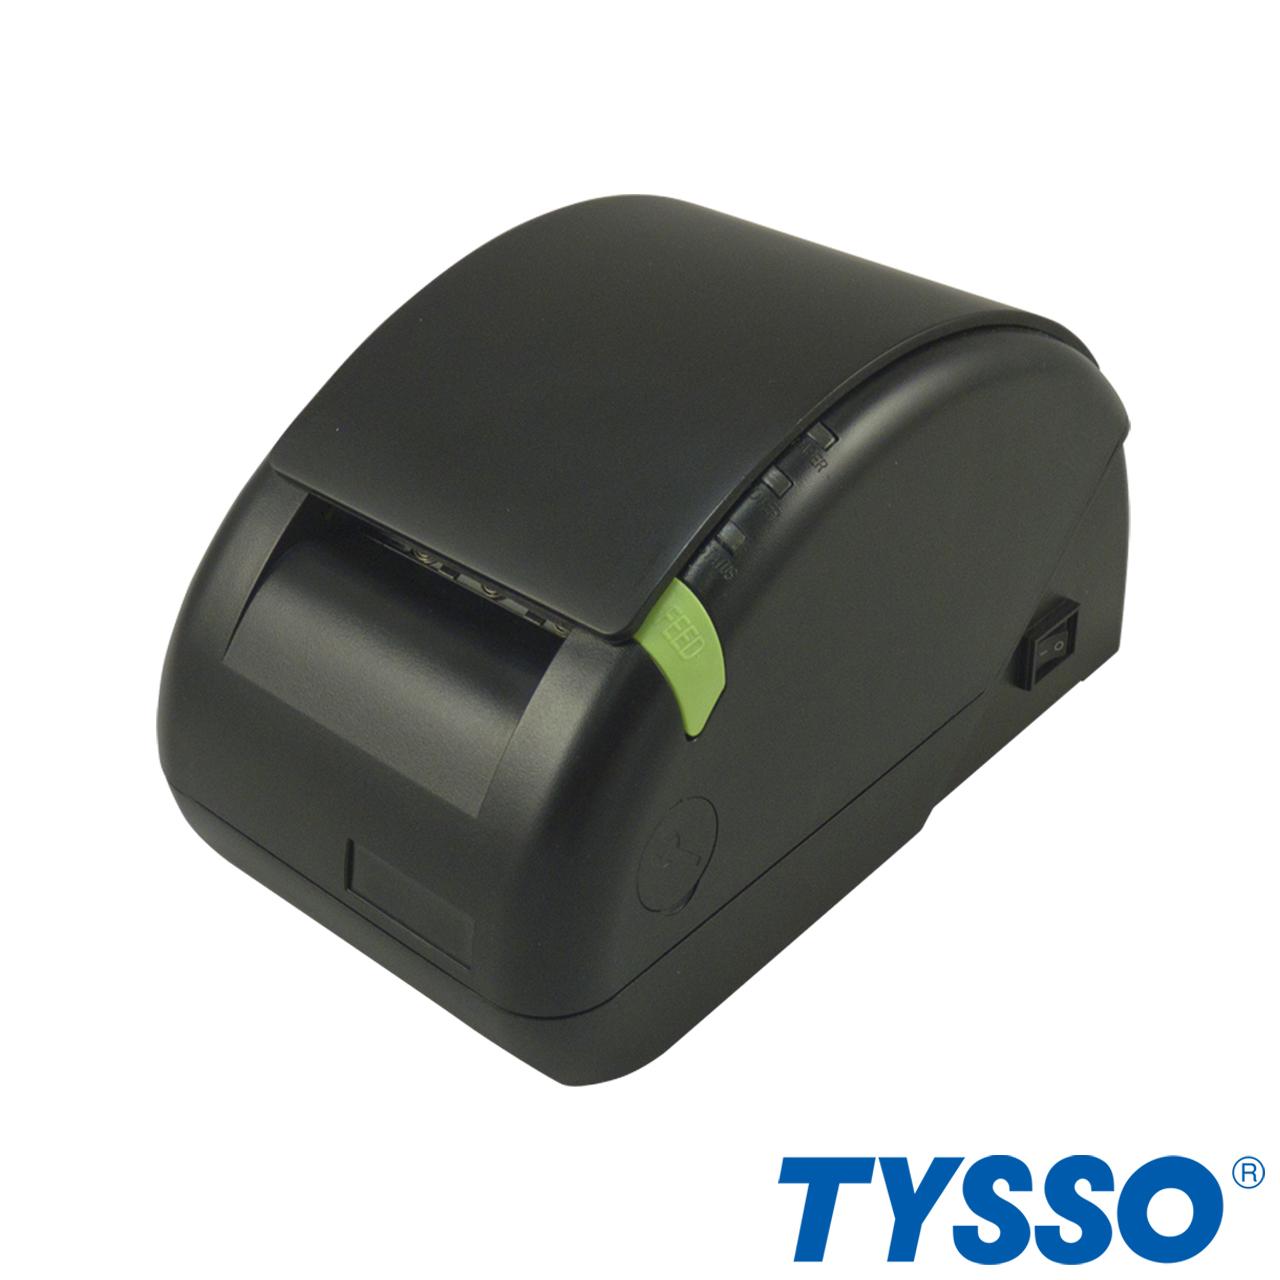 Taiwan 58mm Thermal Receipt Printer | FAMETECH INC